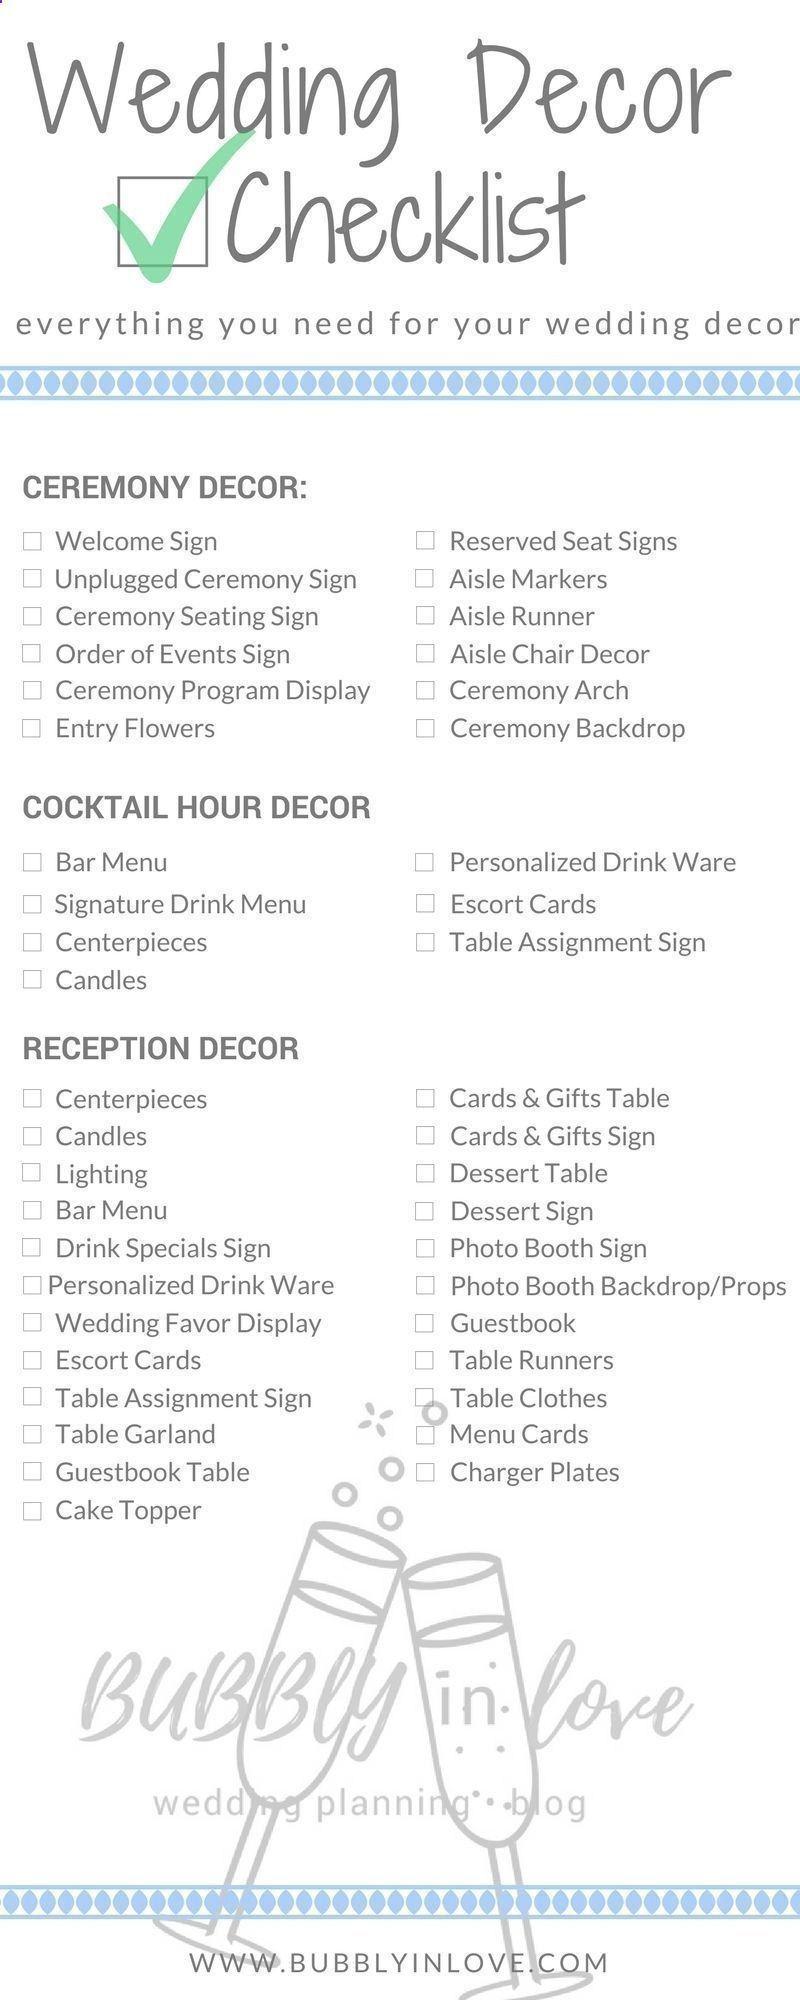 Wedding decorations white november 2018 Wedding Decor Checklist  Wedding Decor  Ceremony Decor  Reception